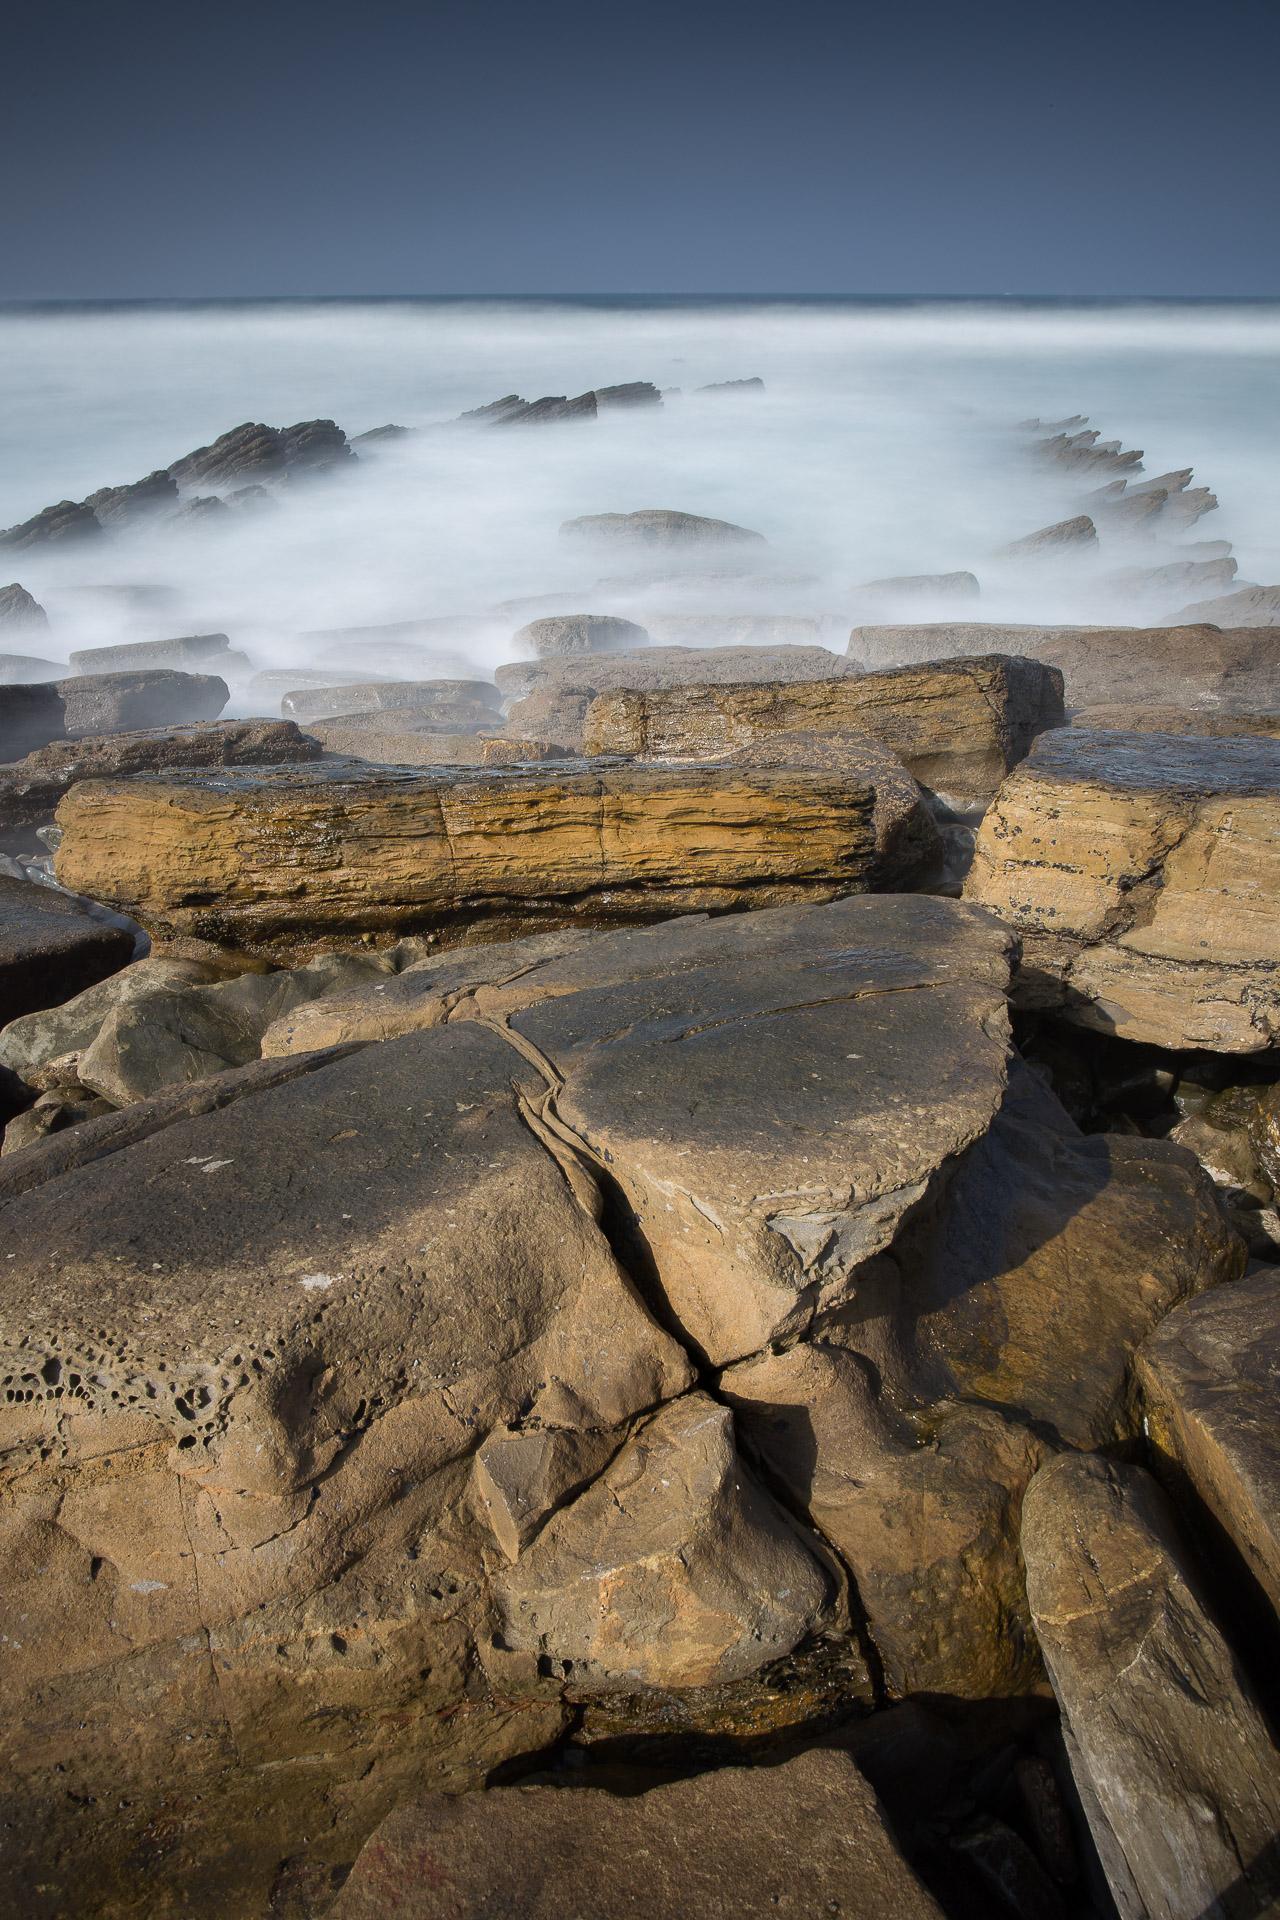 Paisaje playas de Barrika, larga exposición con filtro ND y Canon 6D,Danilatorre,danilatorre, Dani Latorre, daniel Latorre